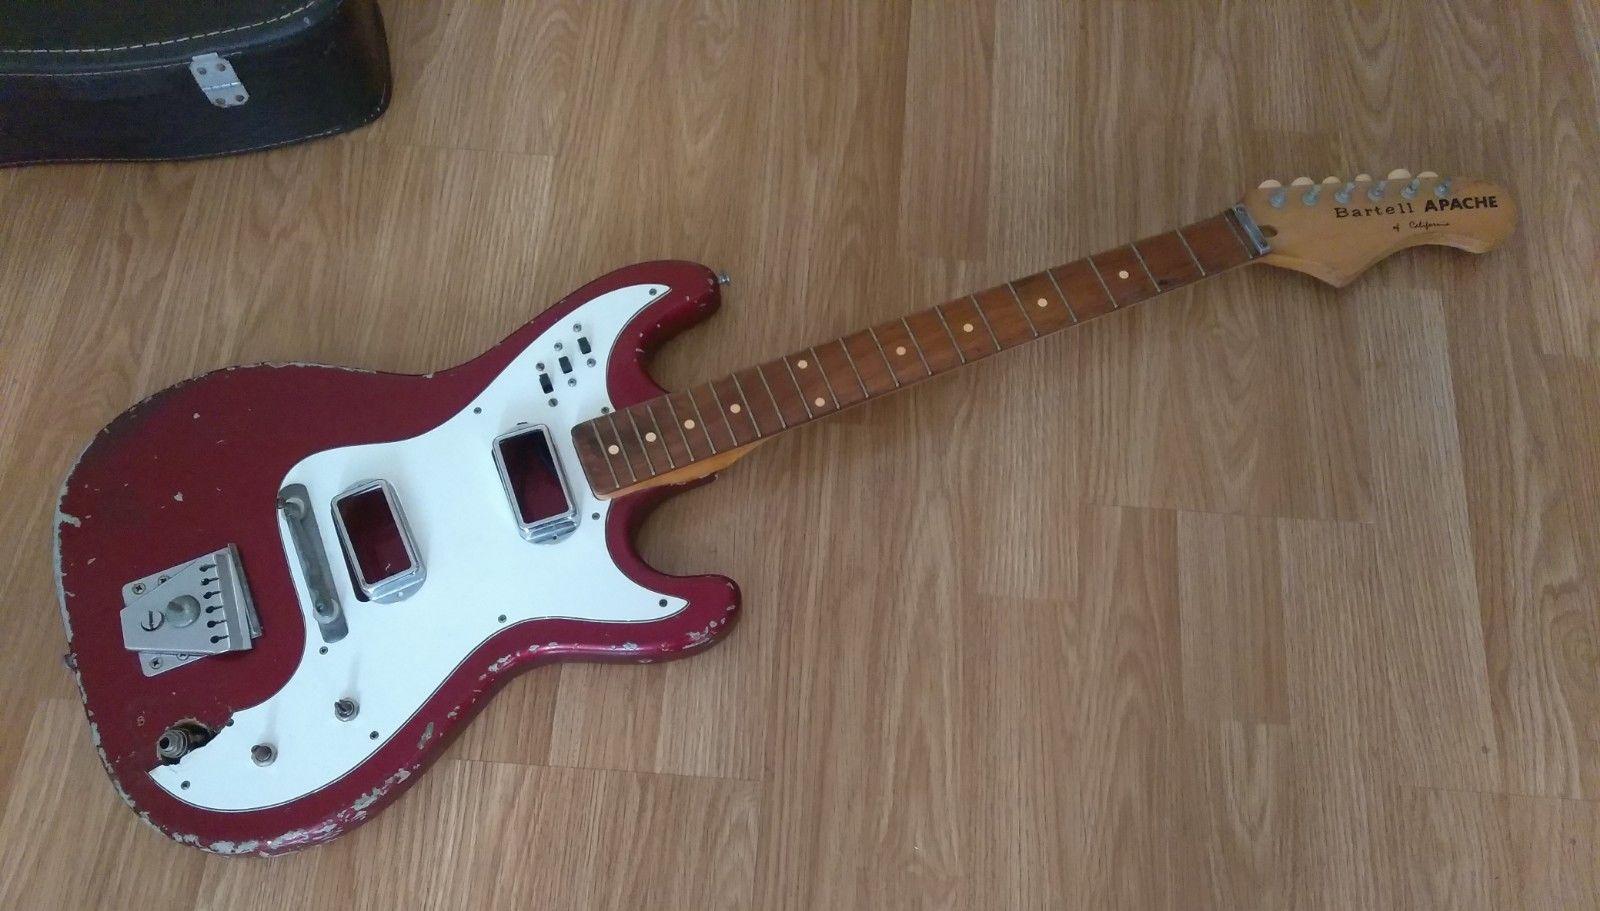 Bartell Apache Electric Guitar